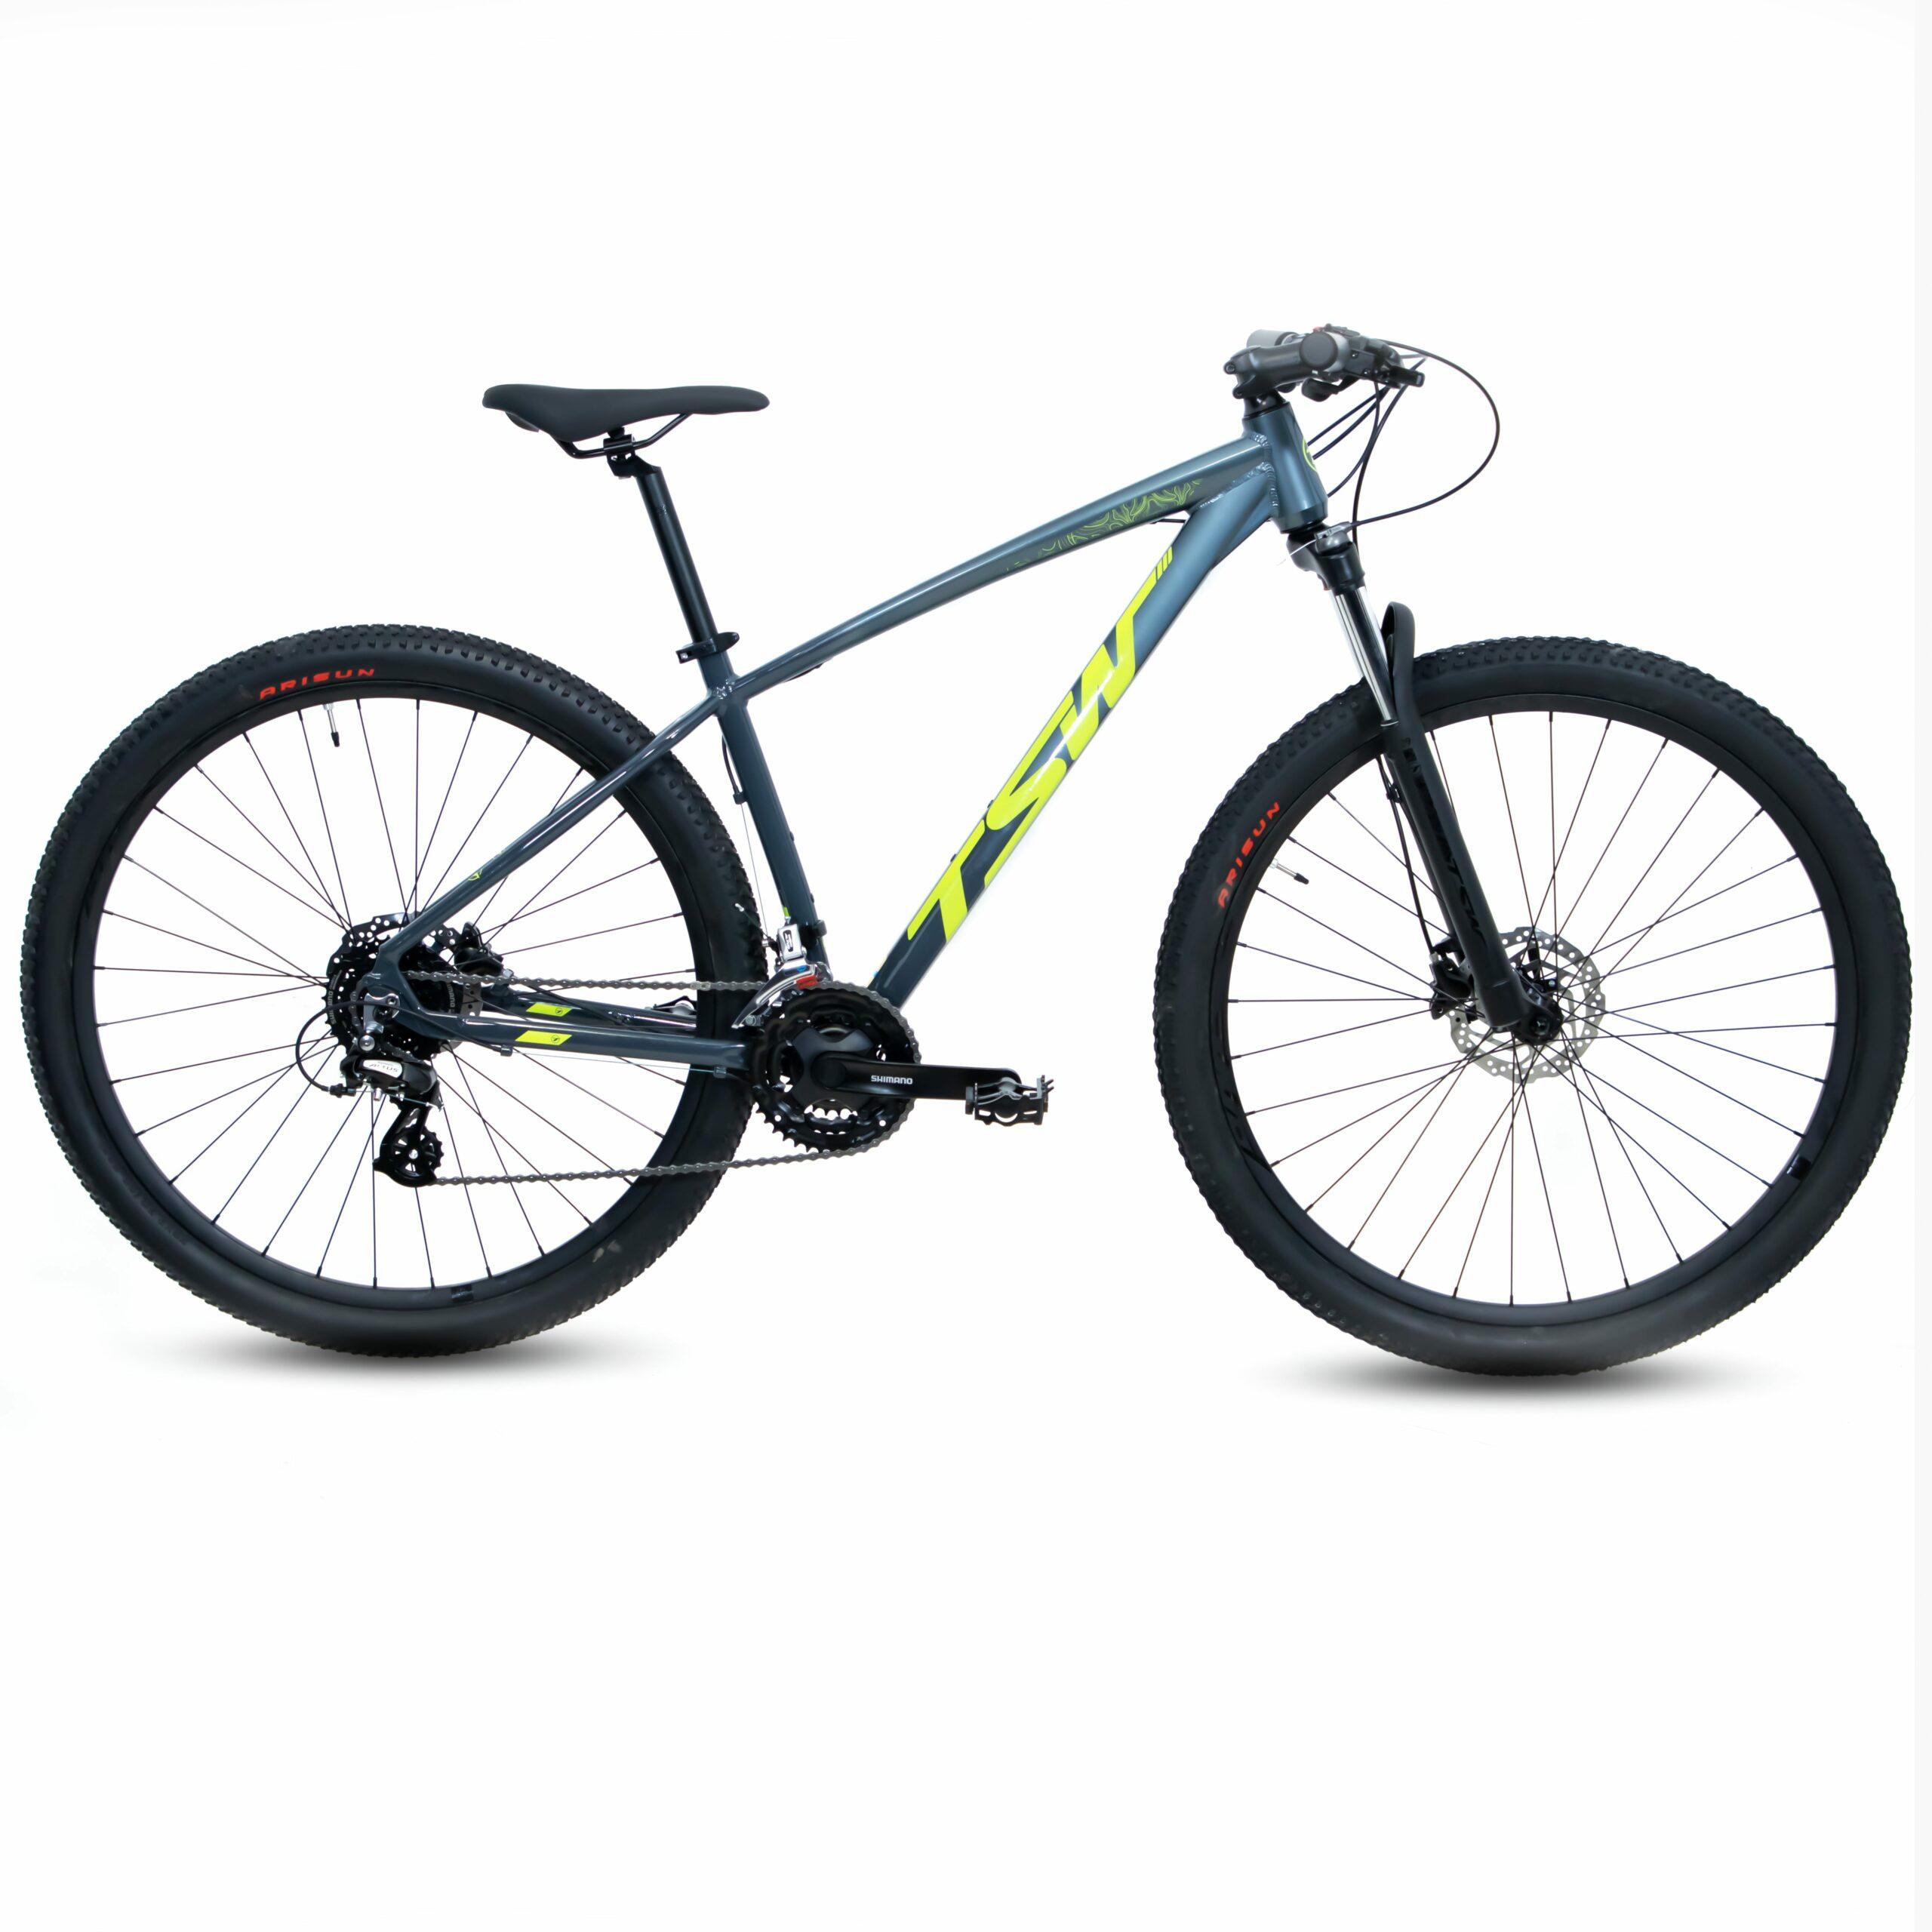 Bicicleta TSW Ride Plus 8